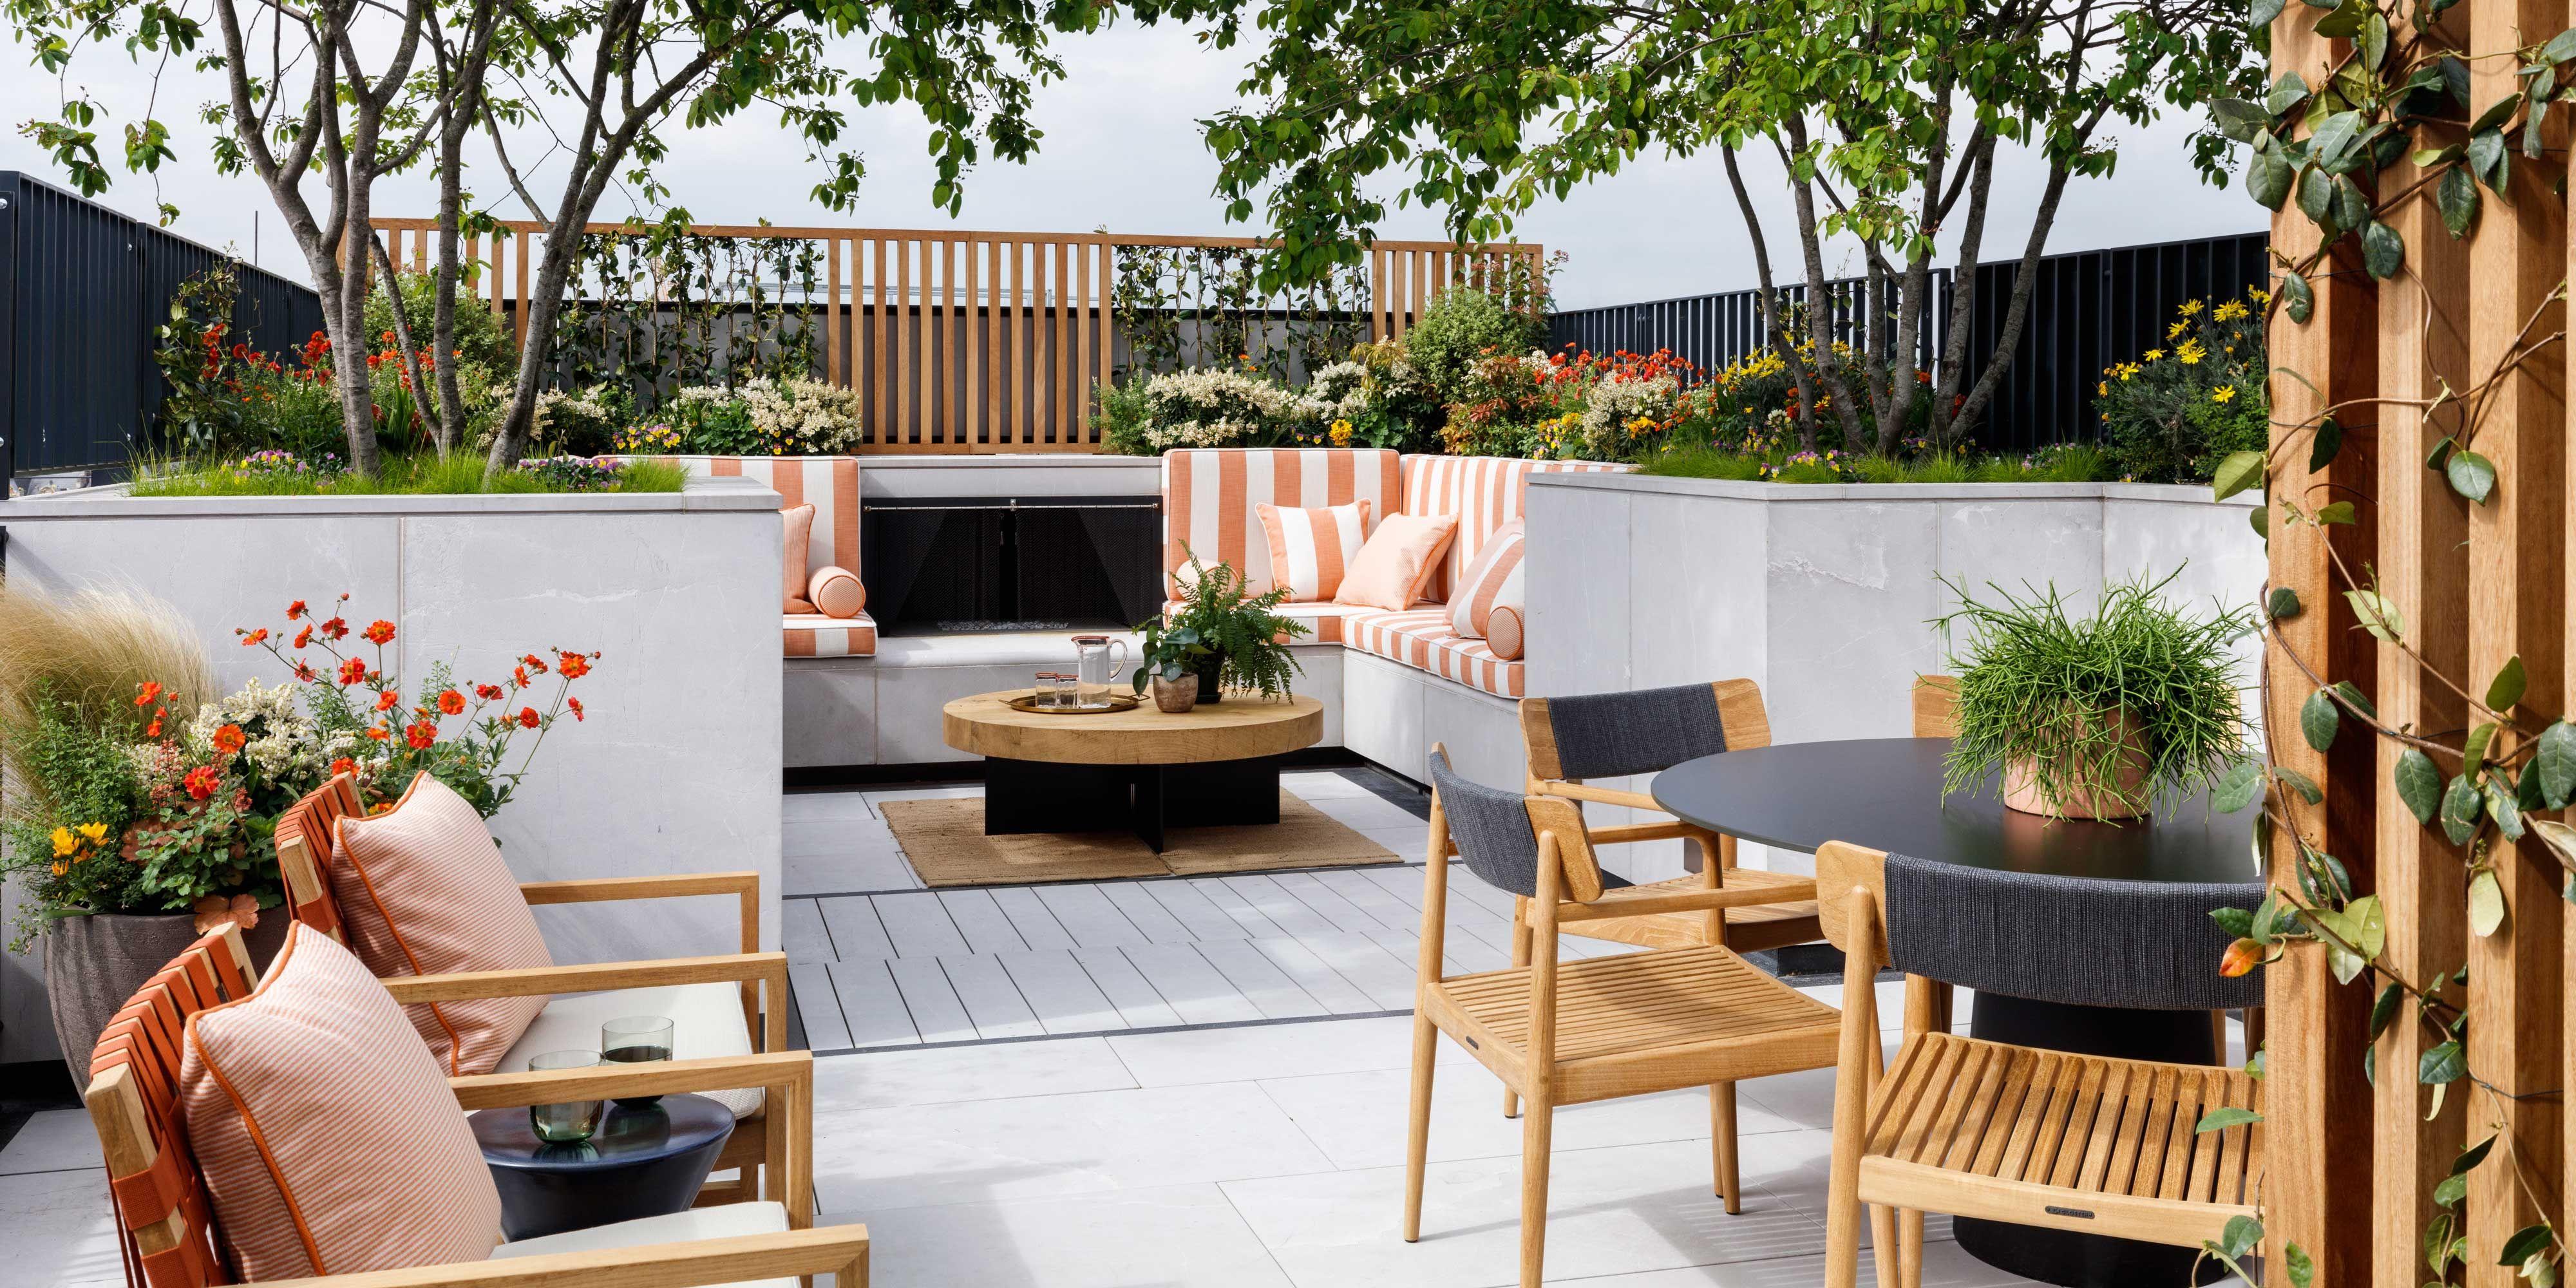 This Covent Garden penthouse is a design aficionado's dream